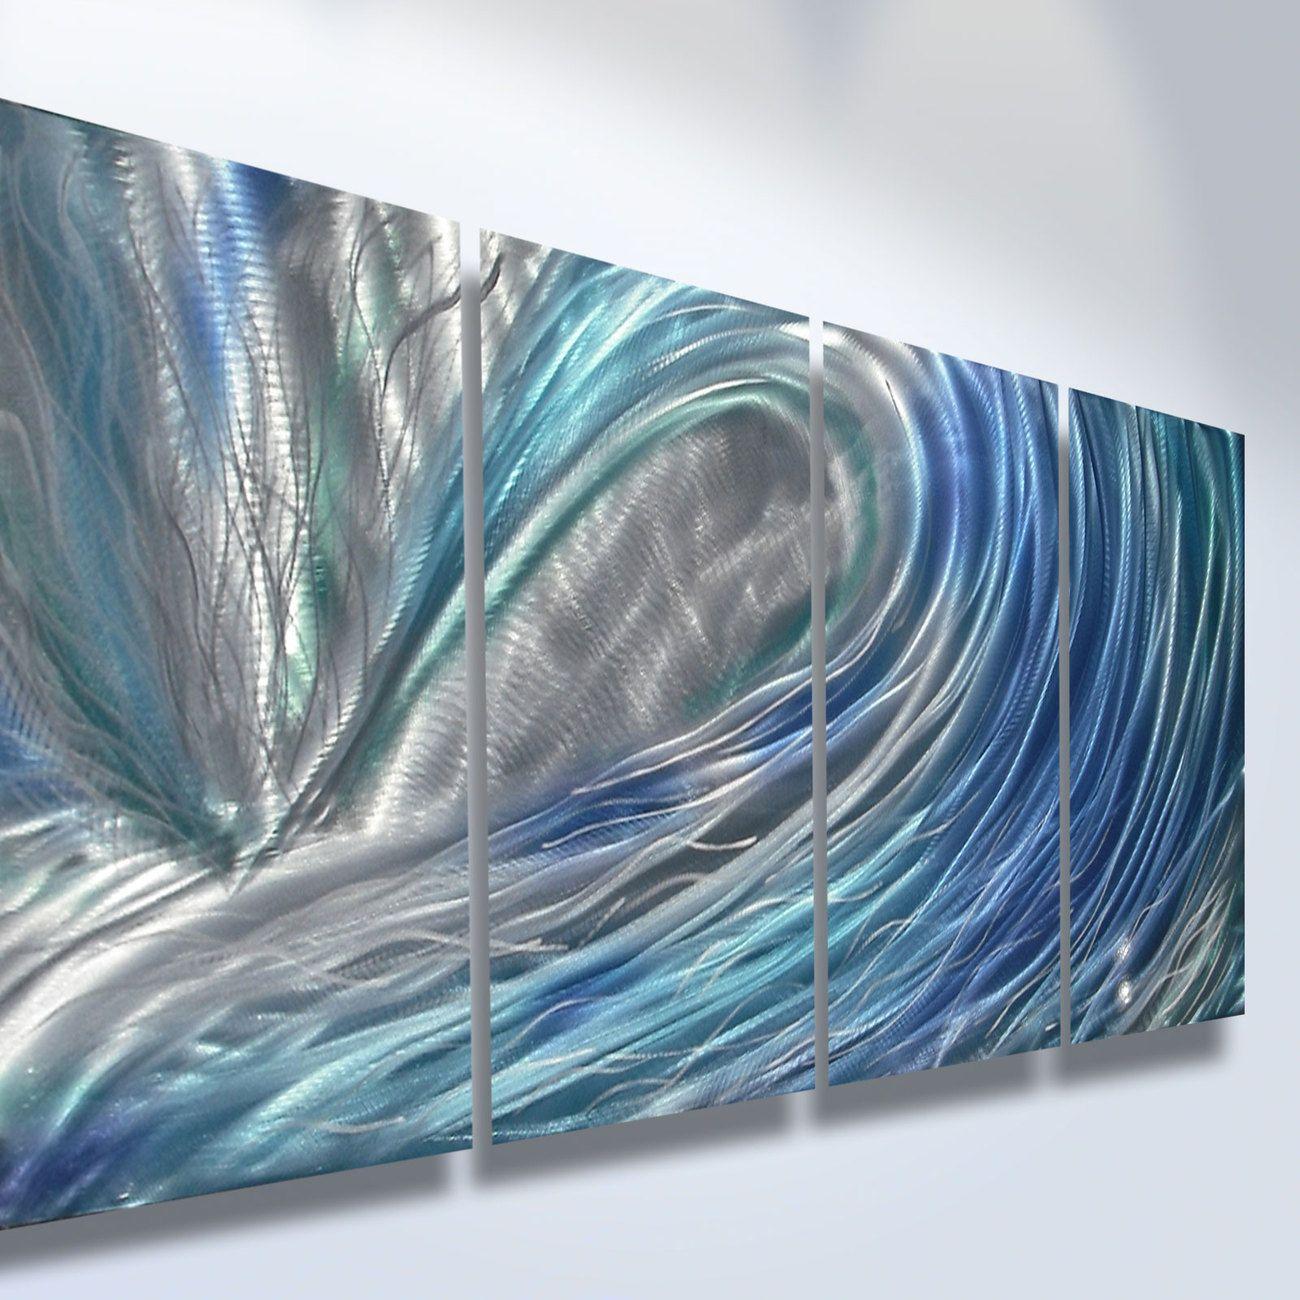 Metal Wall Art Abstract Decor Sculpture Painting Modern Water Wave Blue